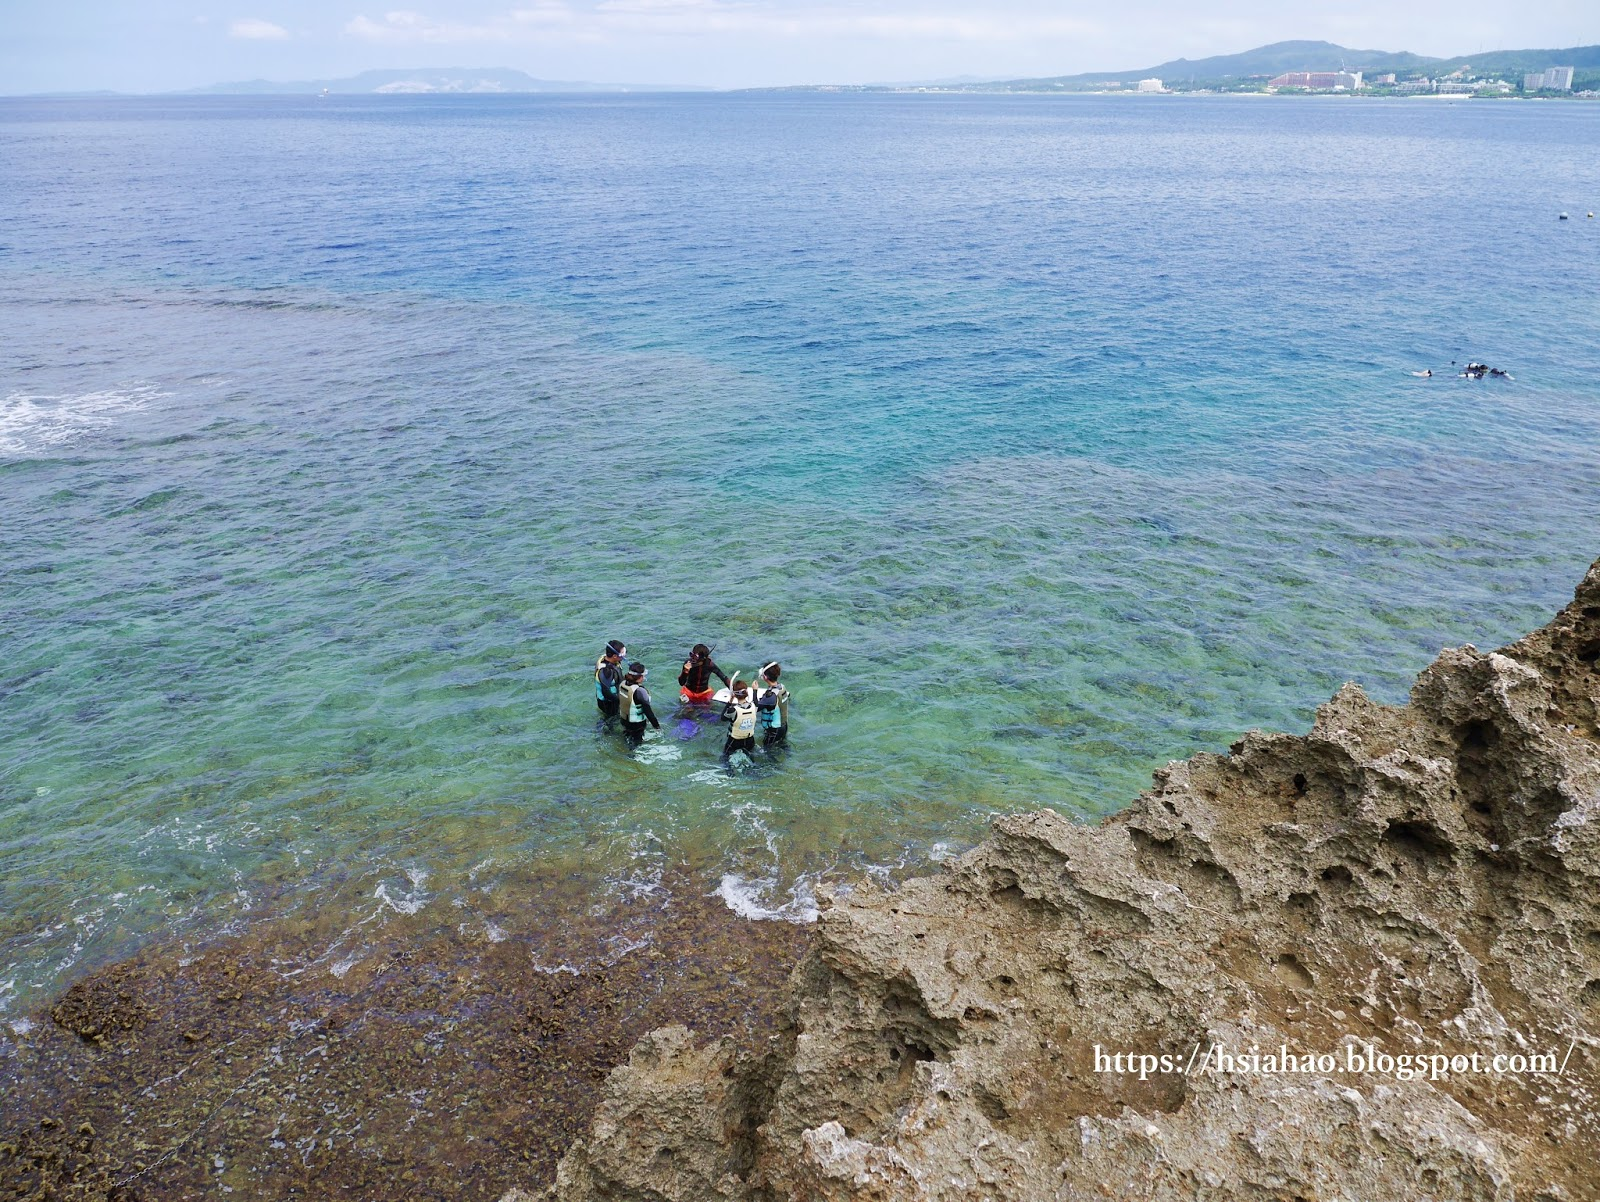 沖繩-景點-推薦-真榮田岬-青之洞窟-潛水-浮潛-青の洞窟-自由行-旅遊-Okinawa-diving-snorkeling-maeda-cape-blue-cave